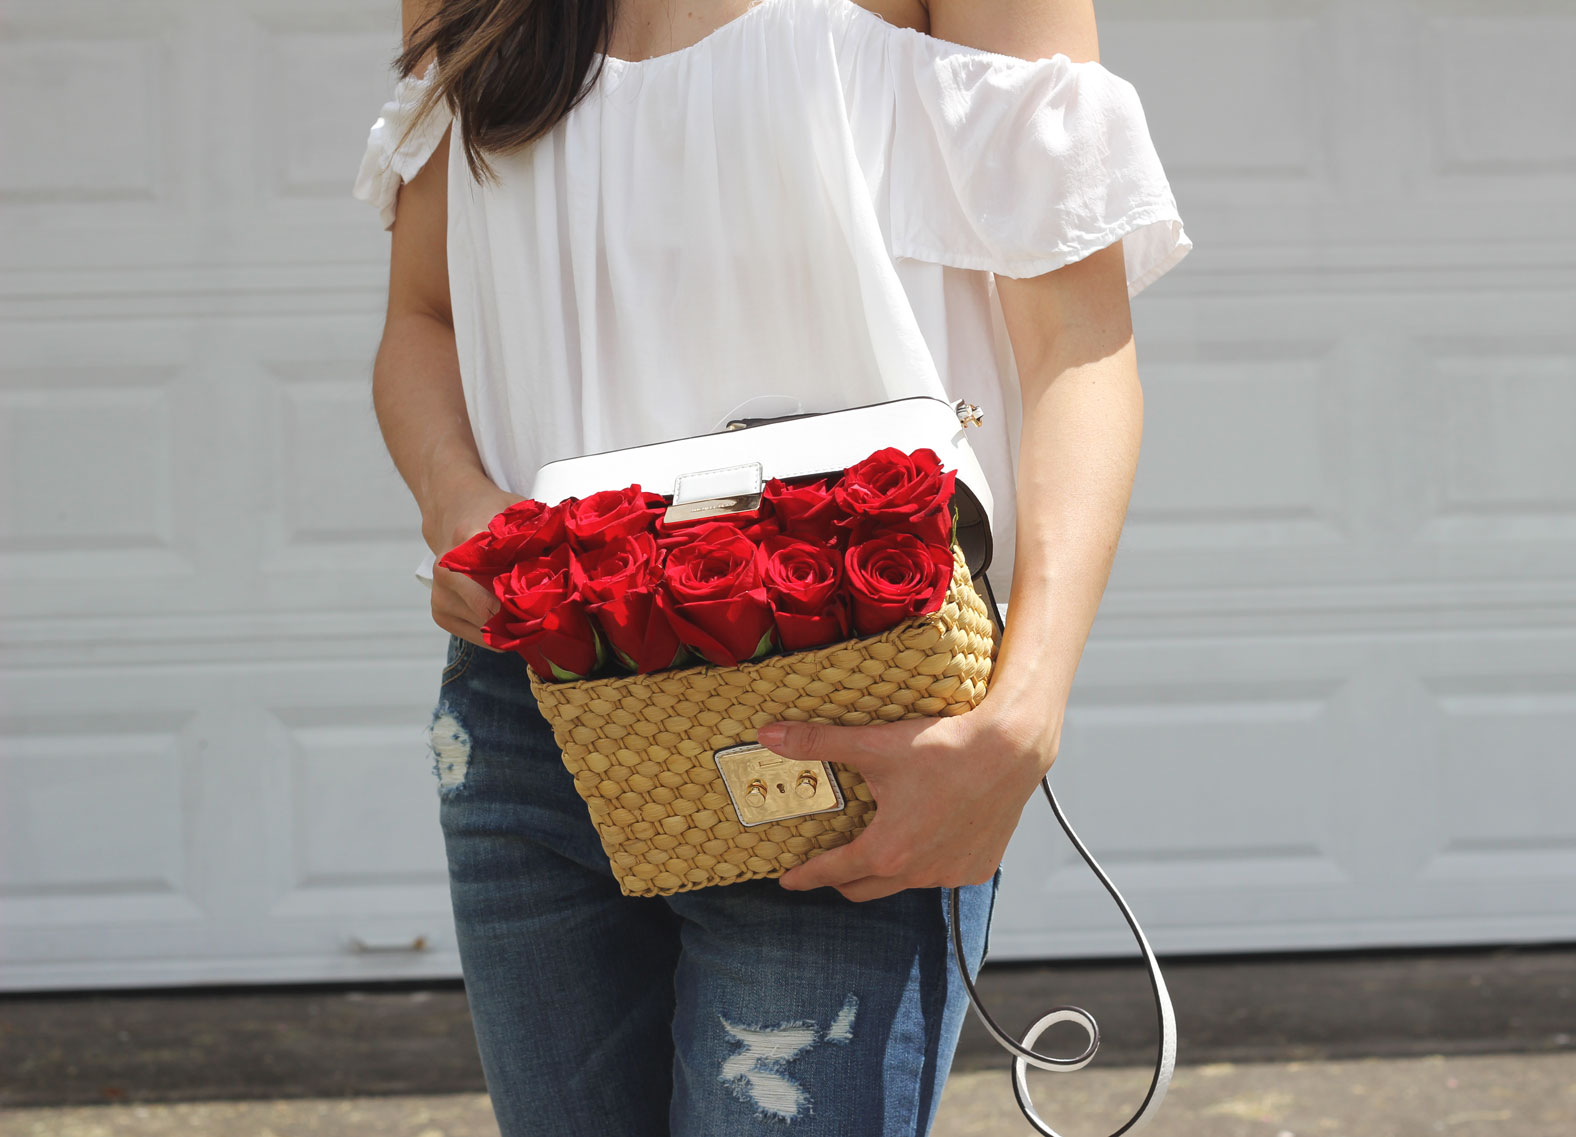 Michael Kors straw picnic basket bag and roses